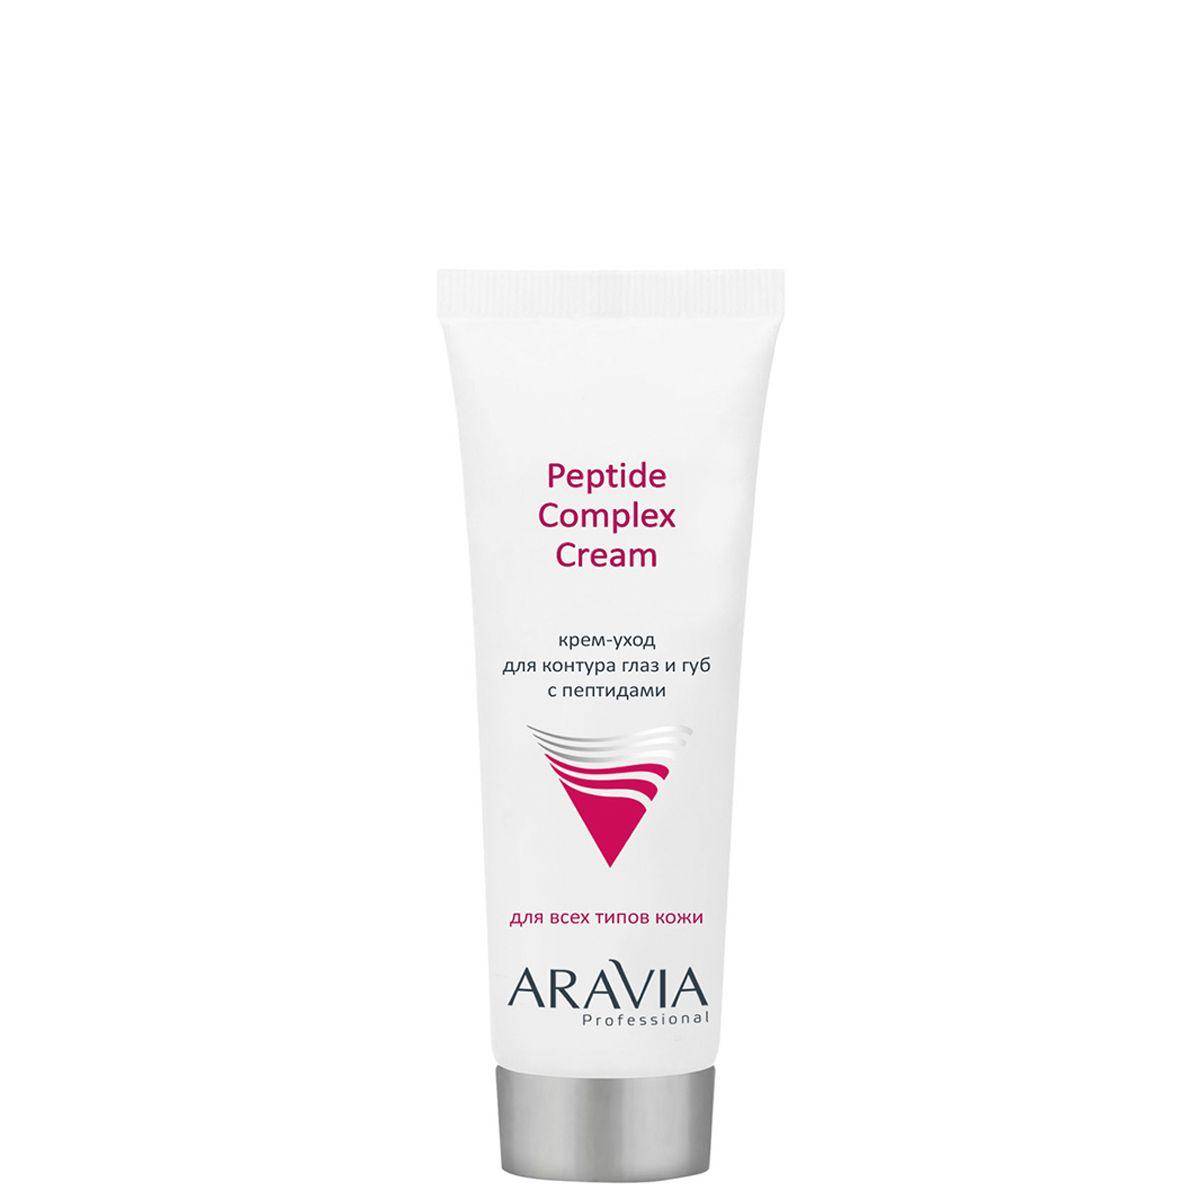 Cream-care For Eye And Lip Contour With Peptides, Peptide Complex Cream, 50 Ml, Aravia Professional